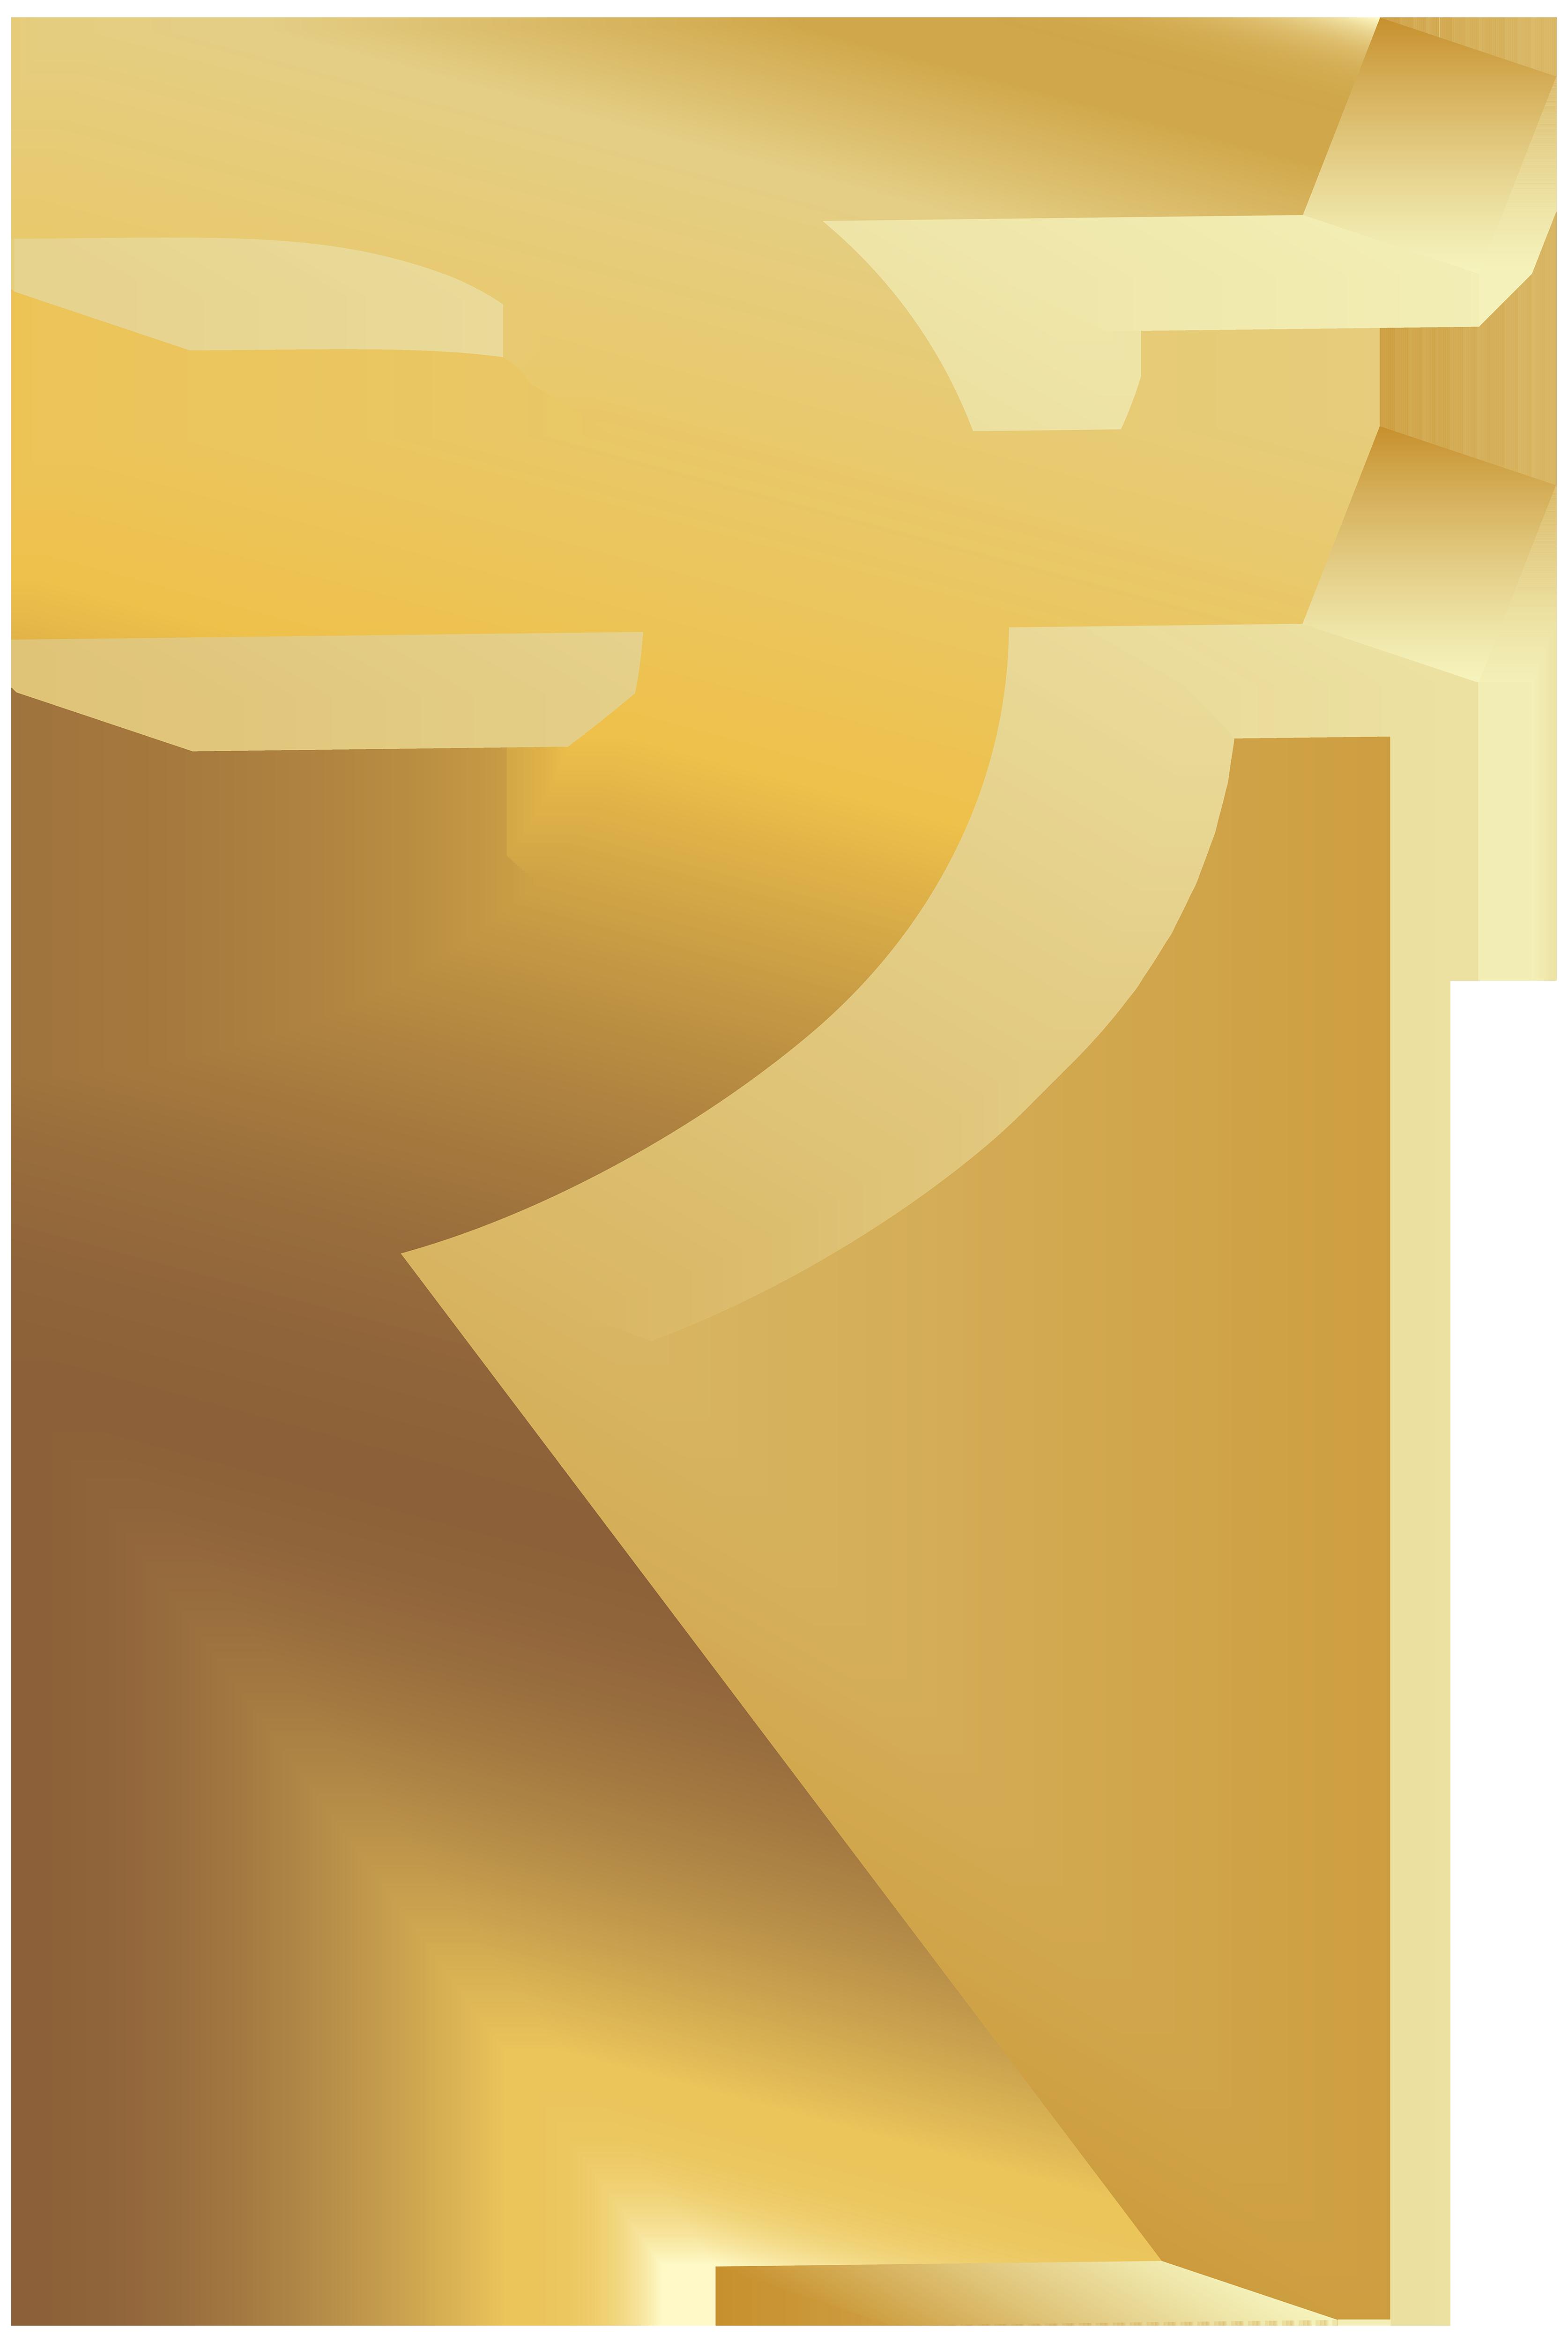 Rupee symbol clipart picture download Rupee Symbol PNG Clip Art - Best WEB Clipart picture download